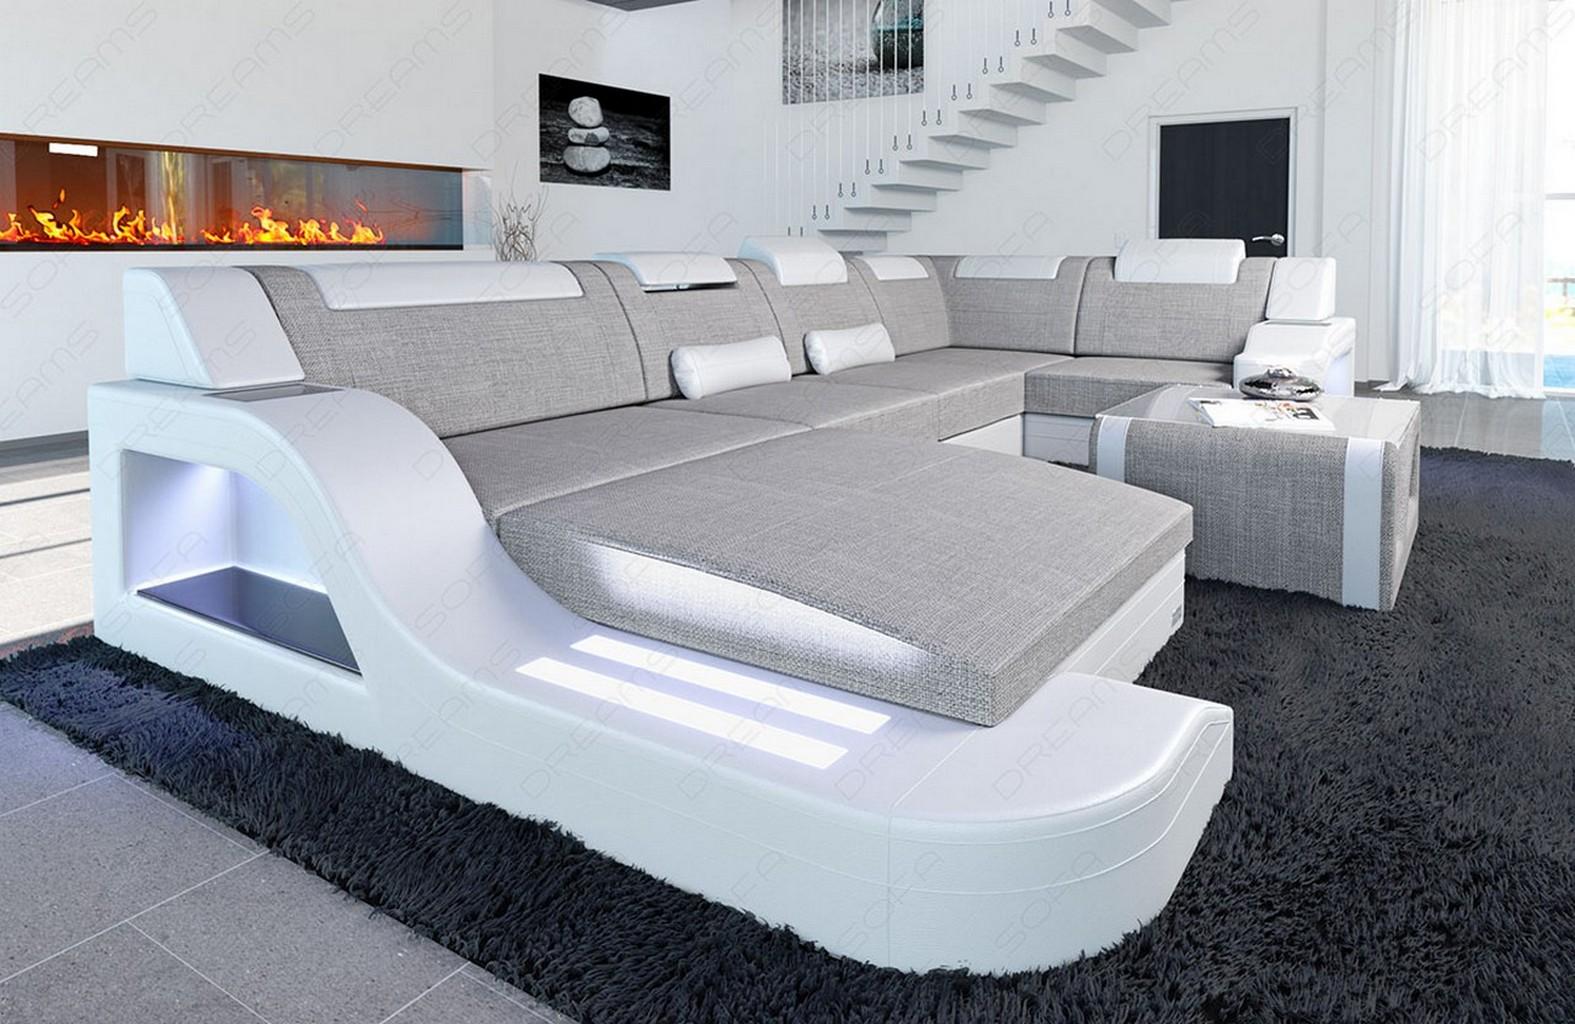 wohnlandschaft luxus designer stoff palermo u form mit ottomane led beleuchtung ebay. Black Bedroom Furniture Sets. Home Design Ideas